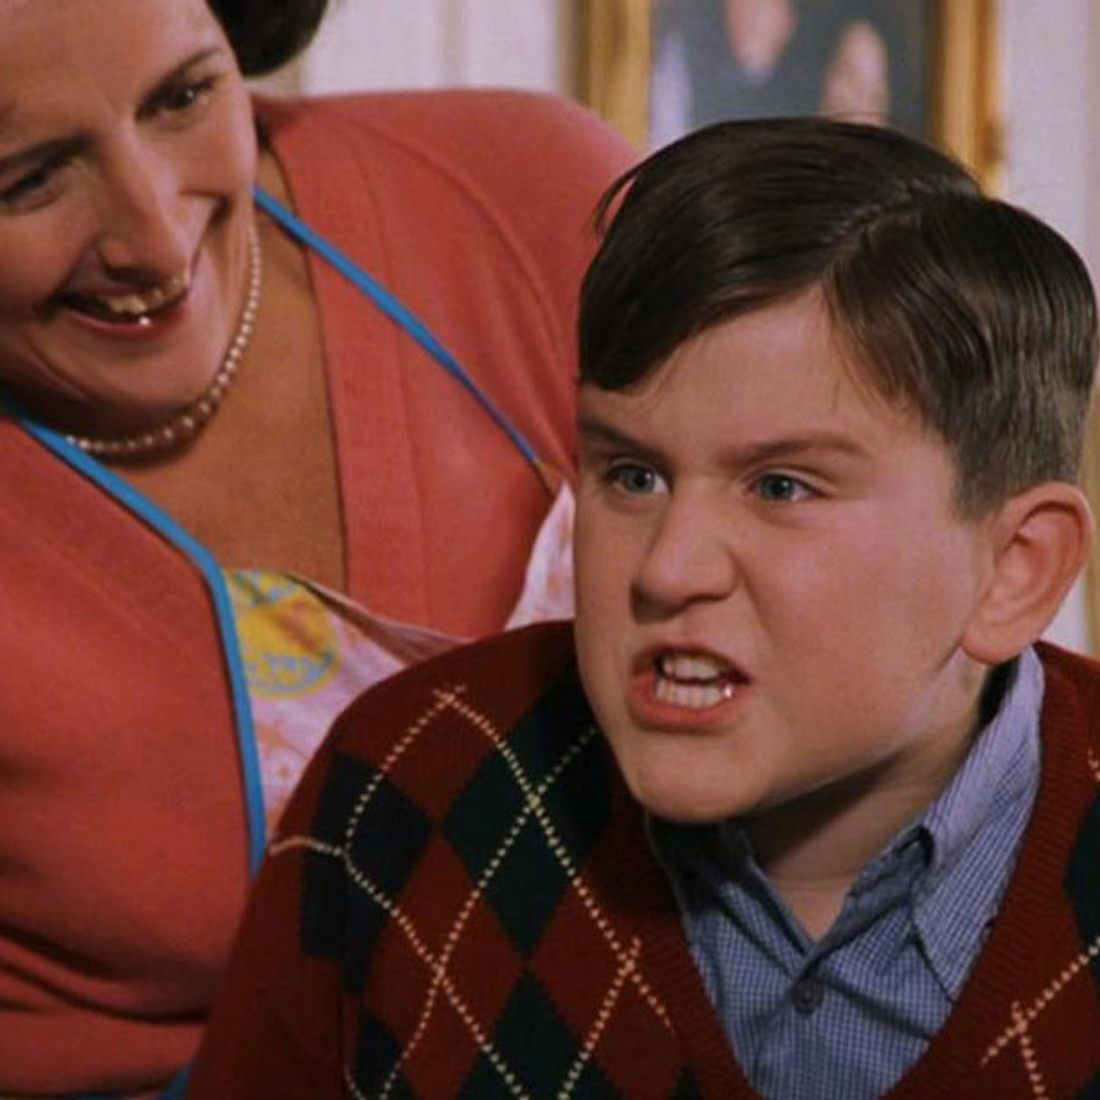 Dudley Dursley - Harry Potter